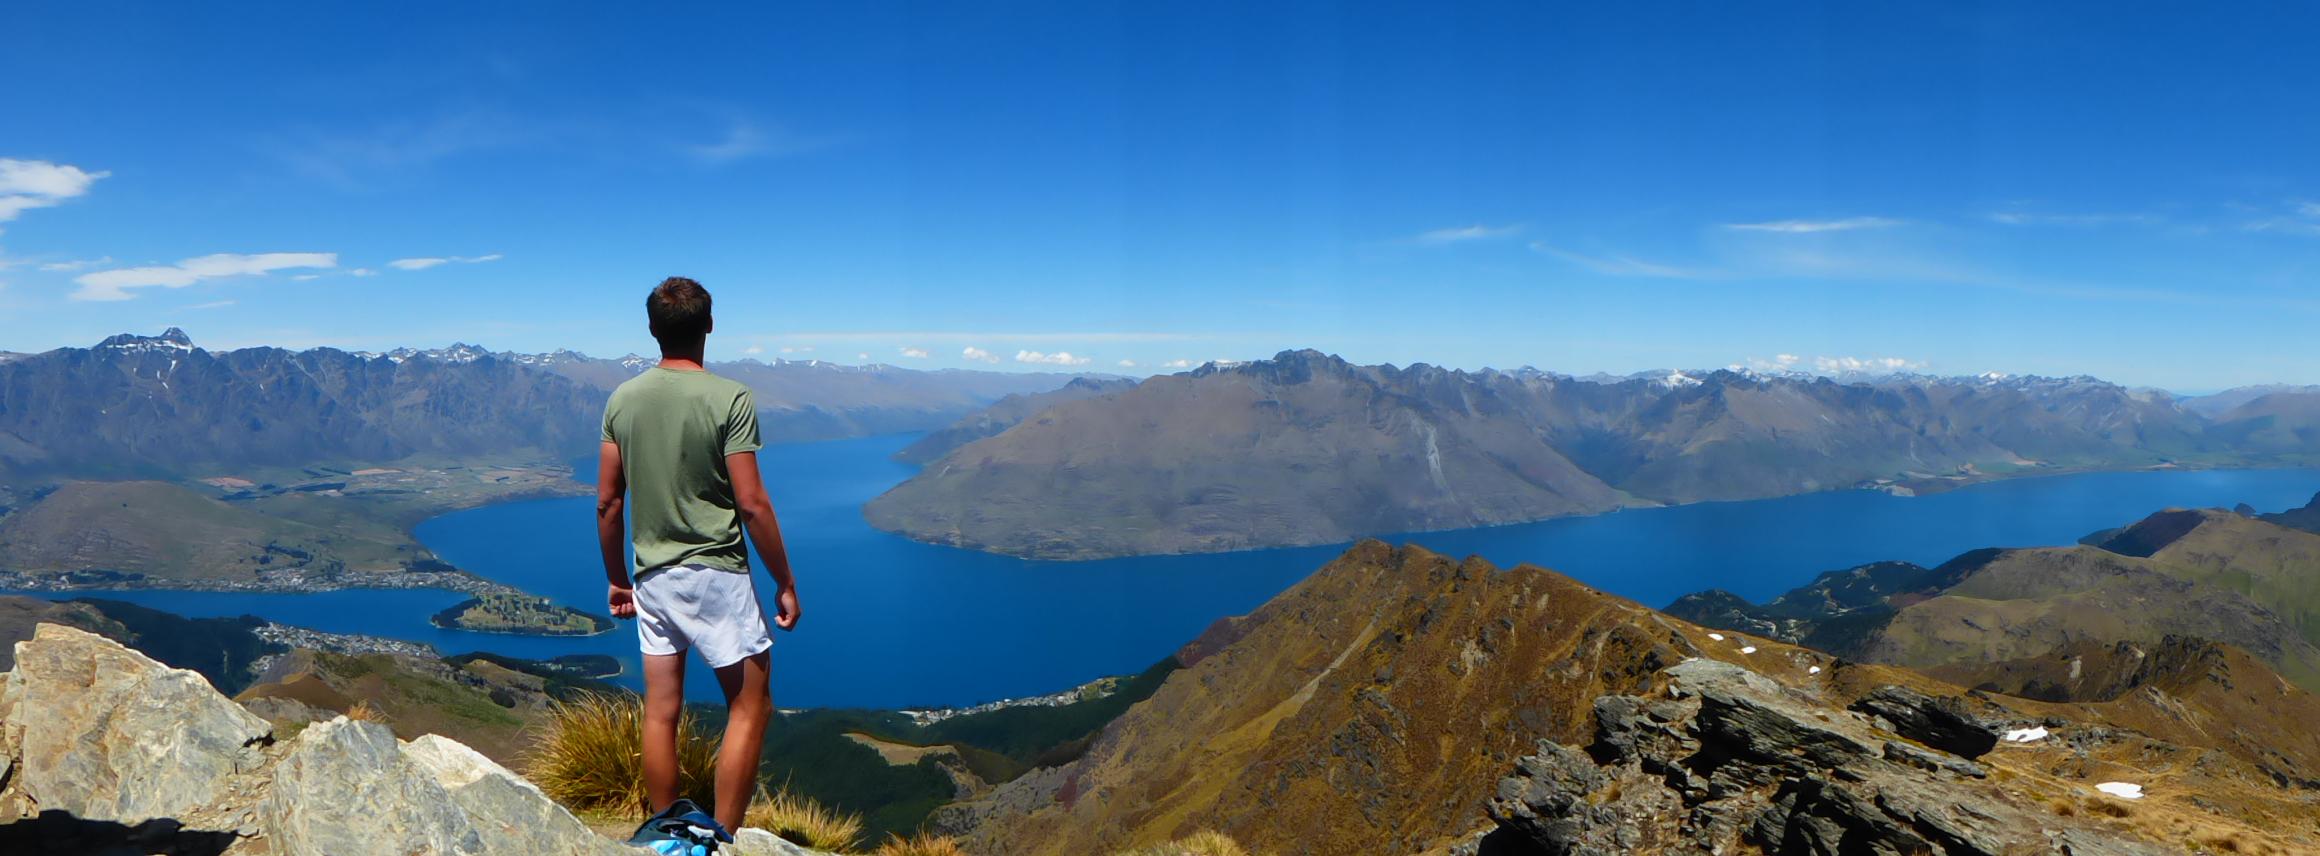 Mathieu - Macon en Nouvelle-Zelande - Ben Lomond summit, Queenstown